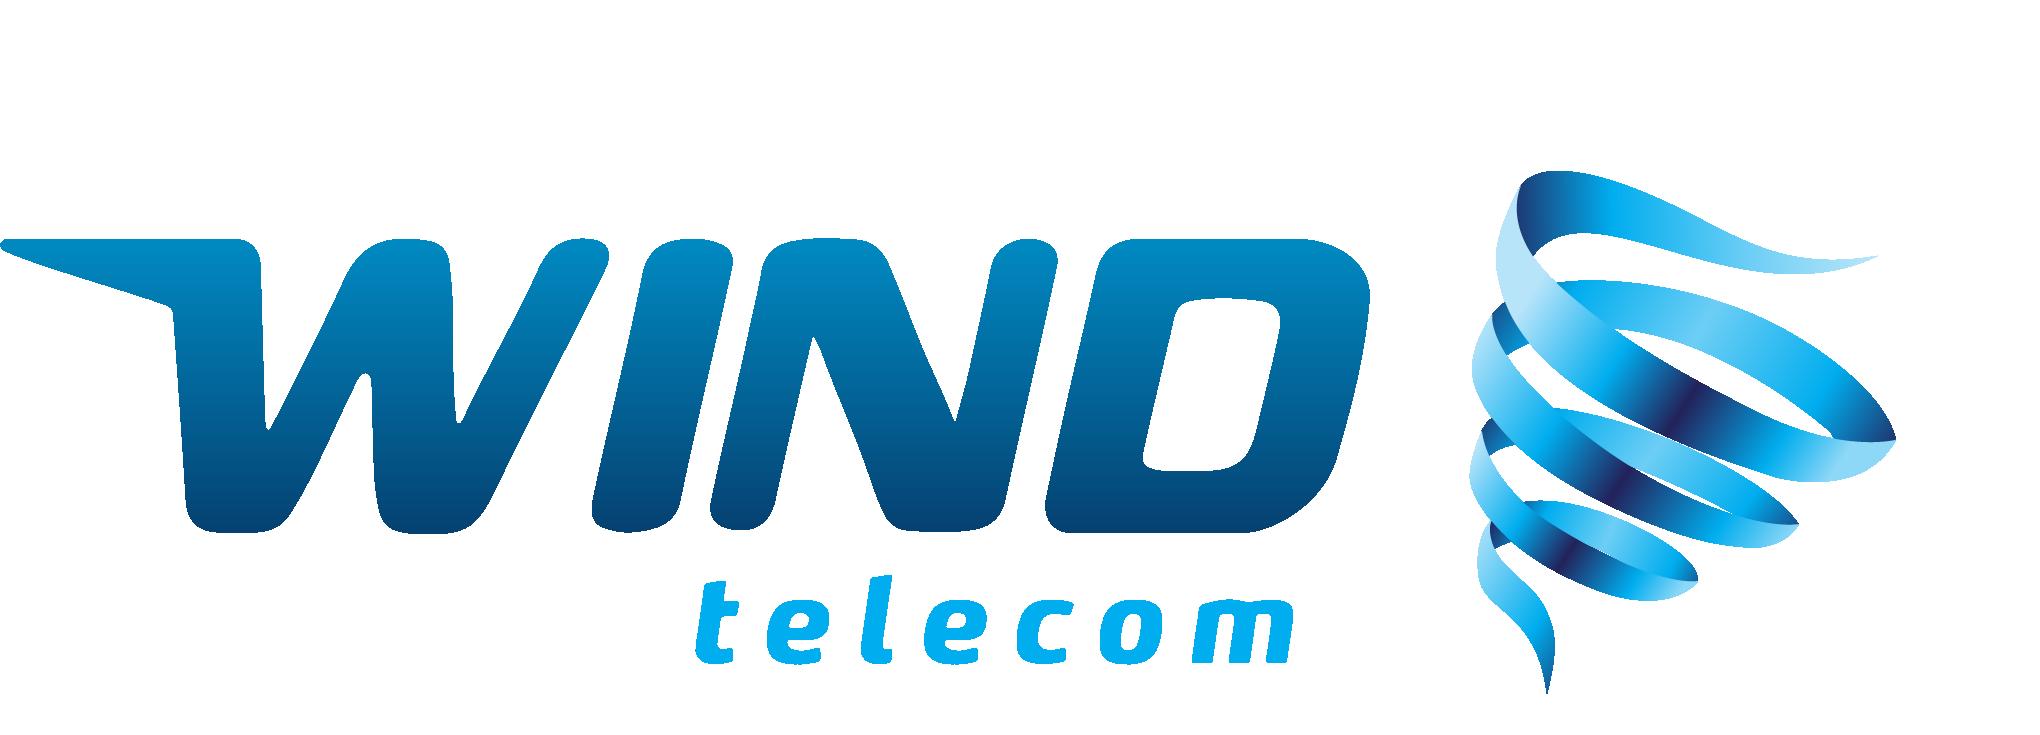 Partners - image Wind-Telecom-Logo on https://gcs-international.com